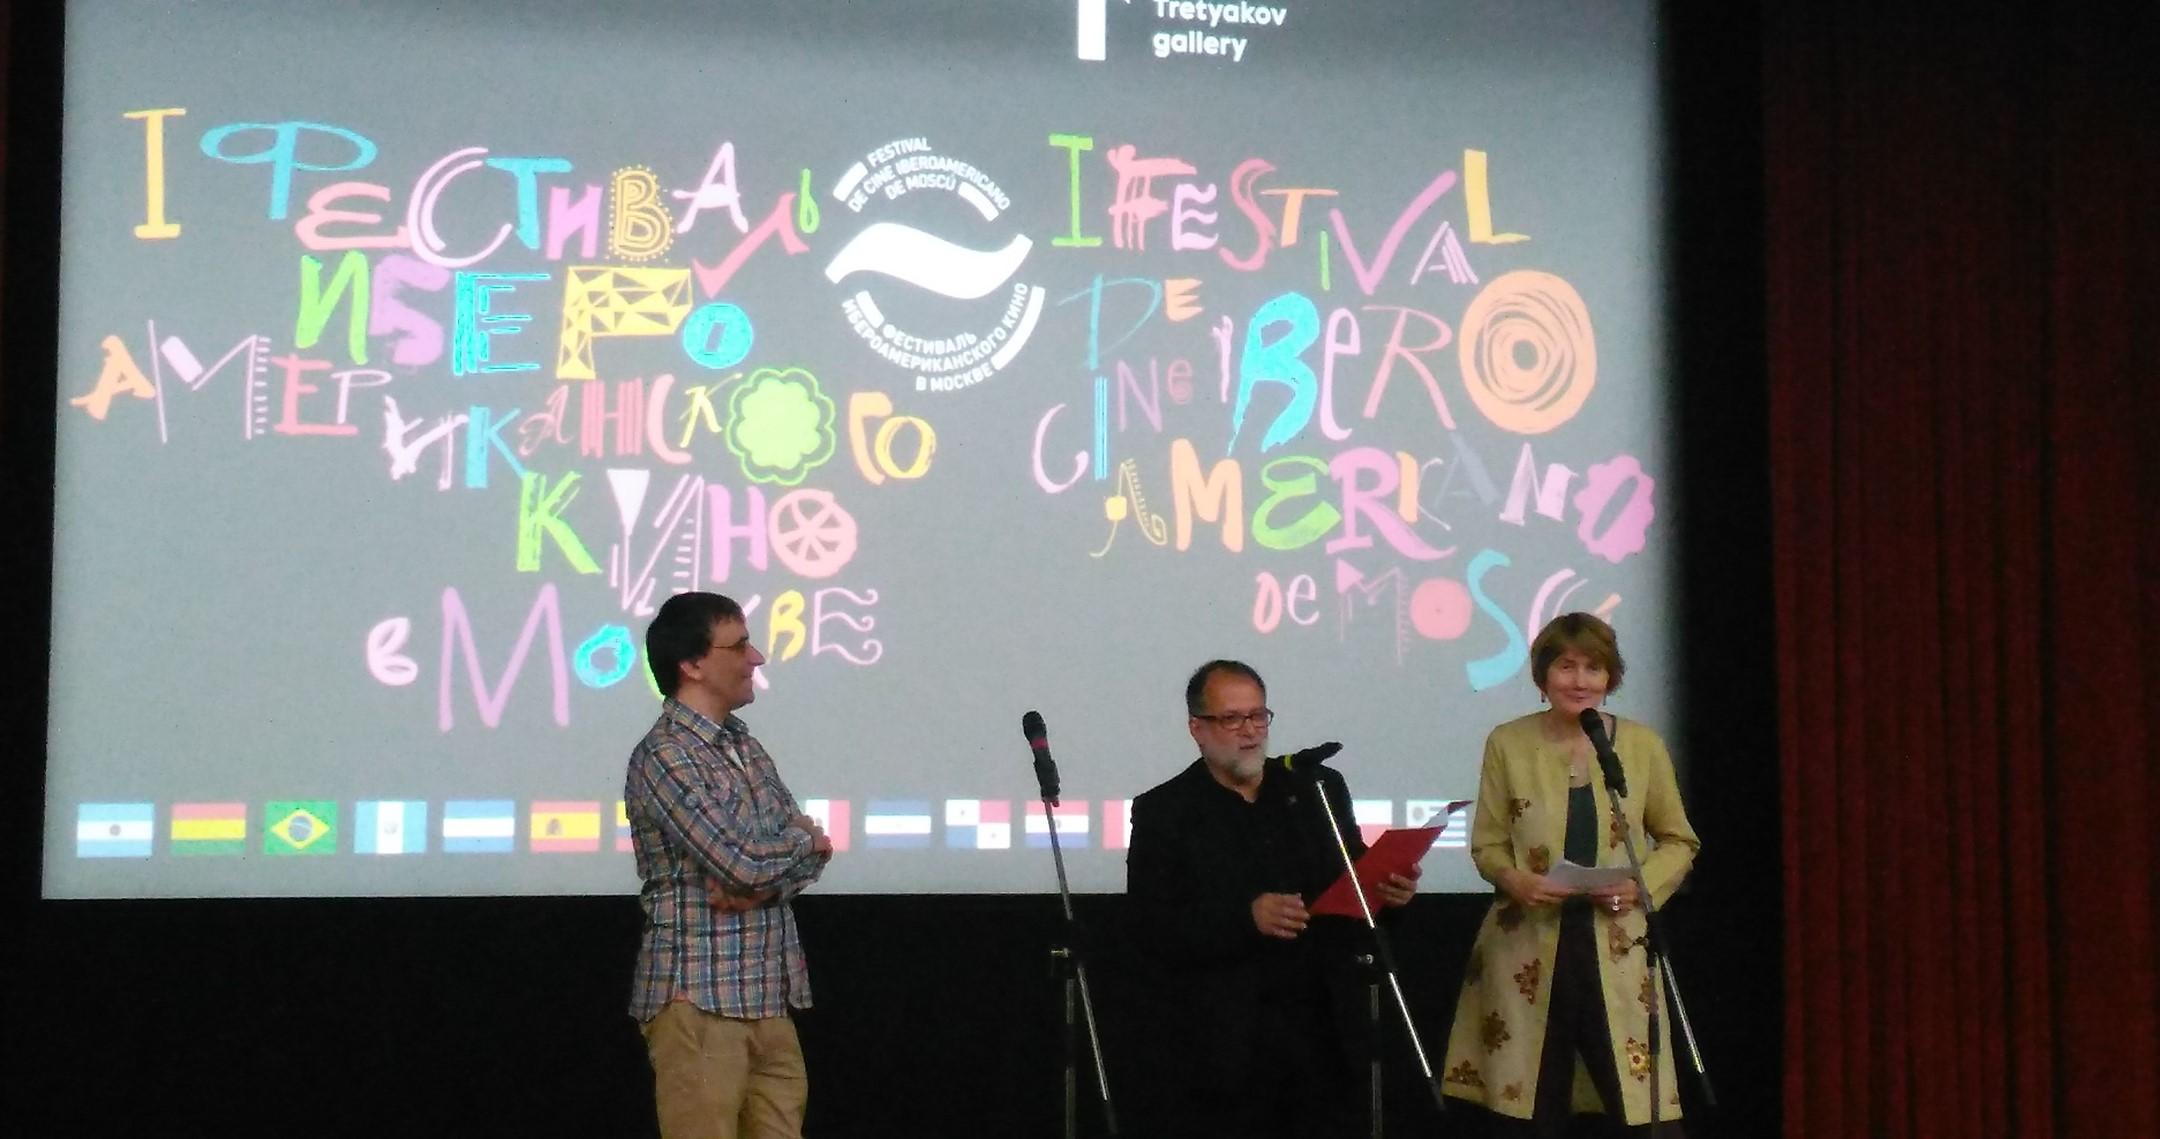 De izquierda a derecha: Maxim Pavlov, Abel Murcia y Tatiana Pigariova, jefa del departamento de cultura del Instituto Cervantes de Moscú